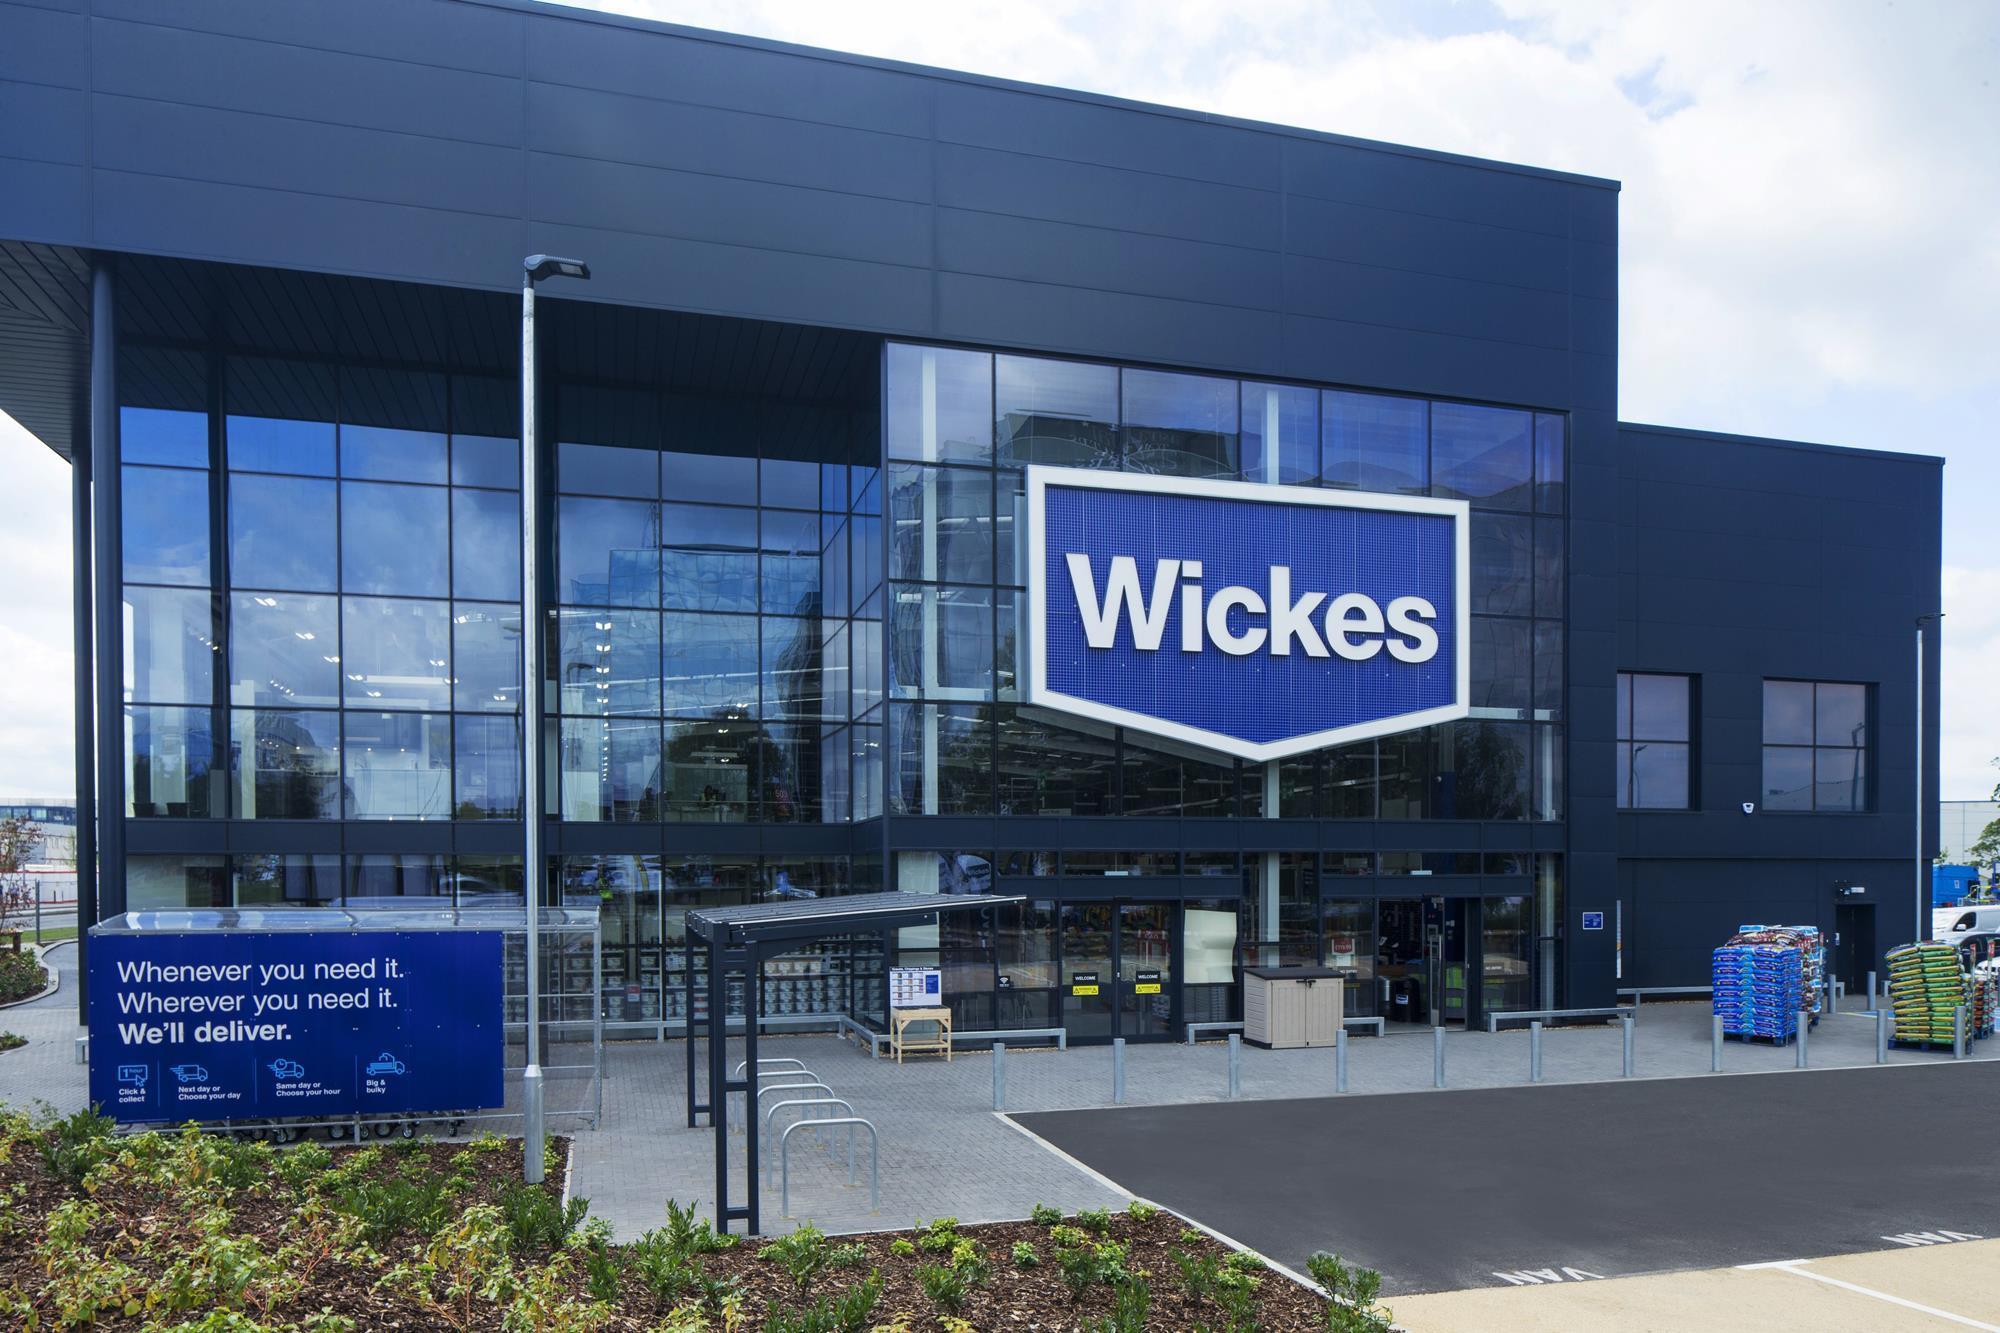 Wickes hiring 900 staff in bid to poach B&Q expertise | News ...